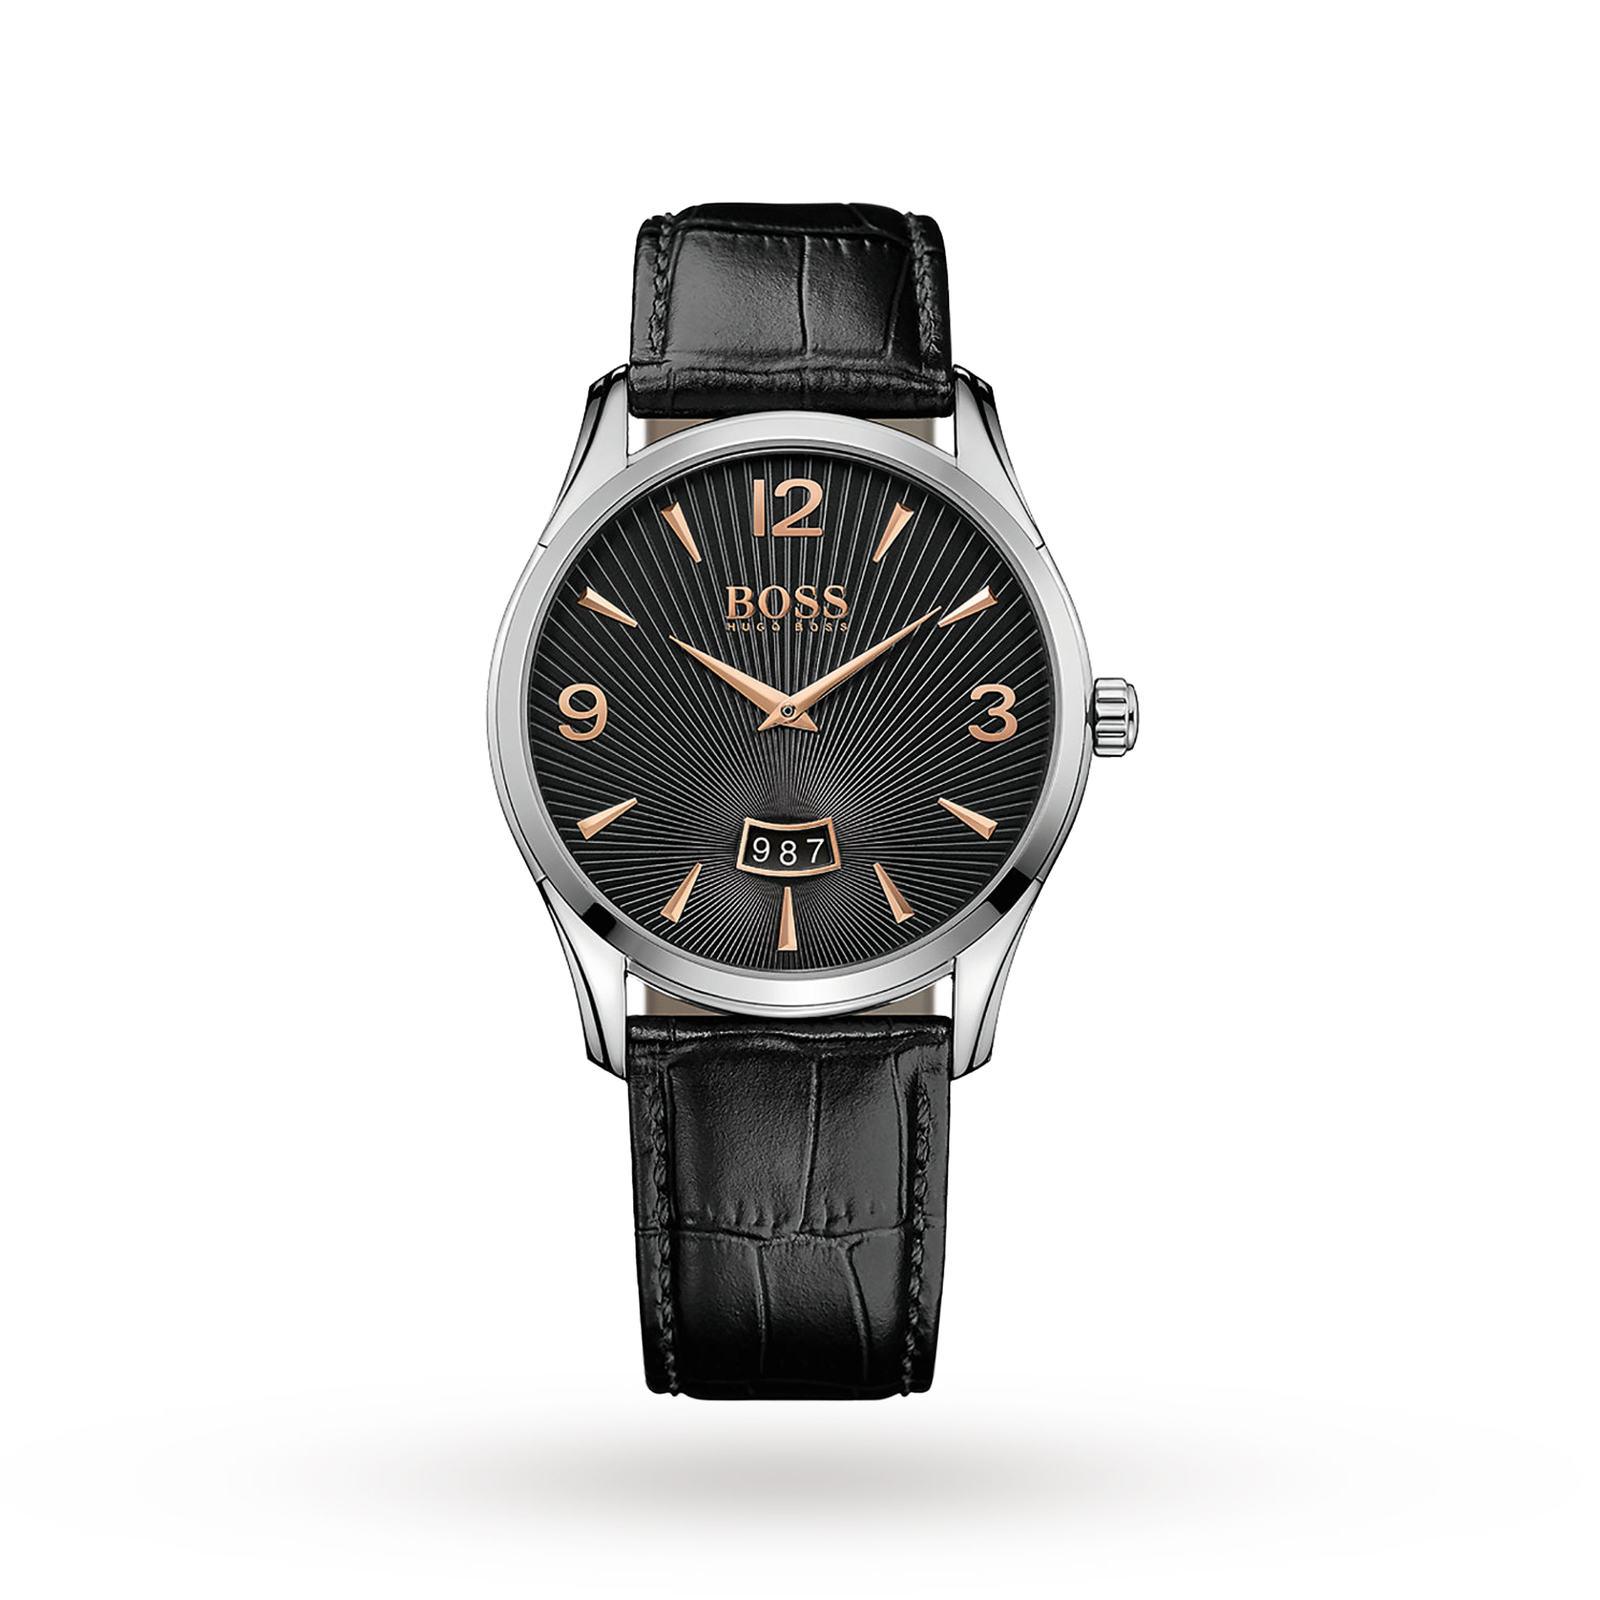 HUGO BOSS BOSS Black 1513425 Commander Watch was £149 now £70 at Goldsmiths